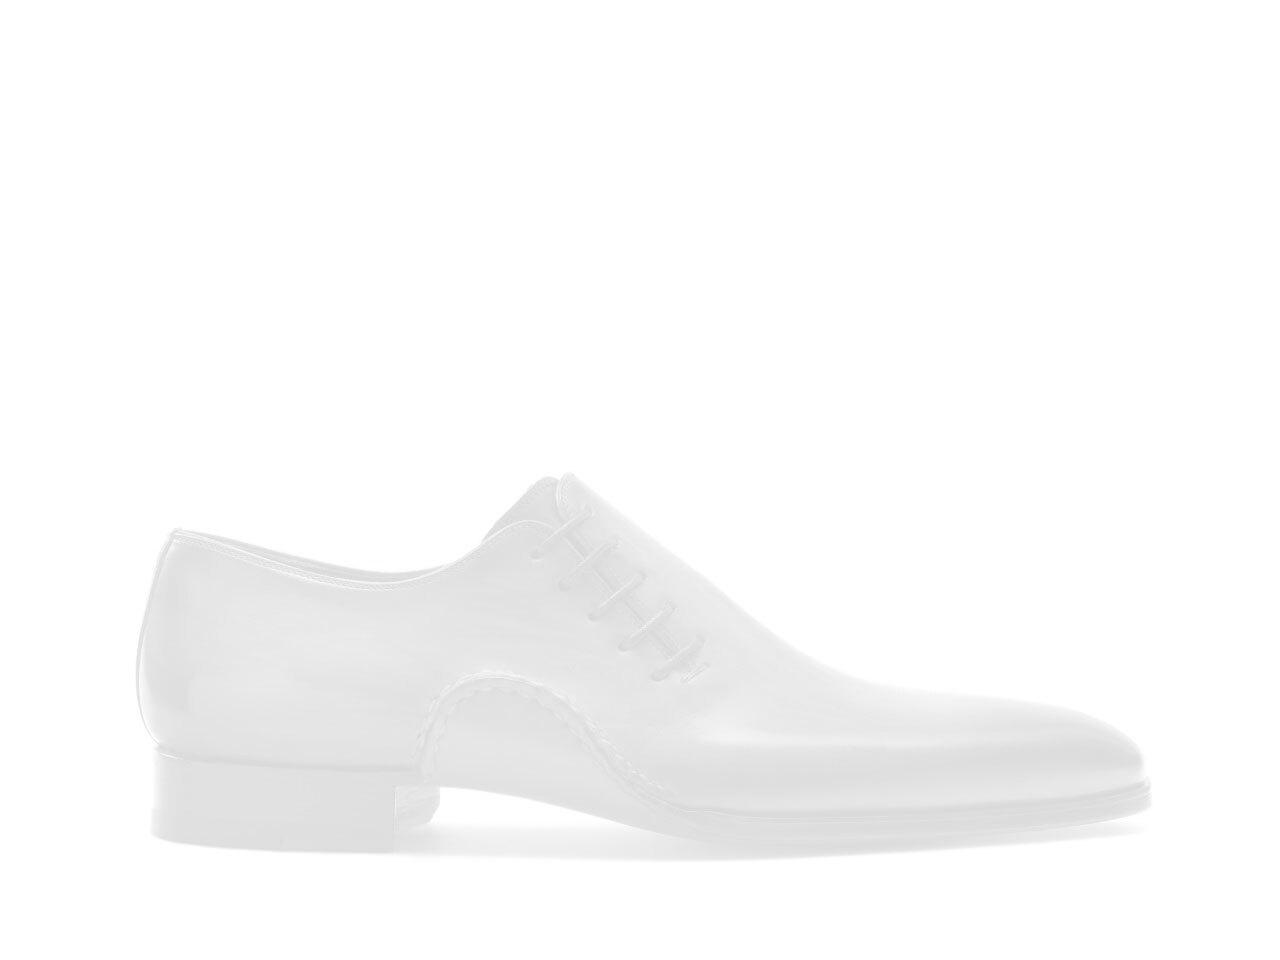 Sole of the Magnanni Armando Grey Men's Oxford Shoes